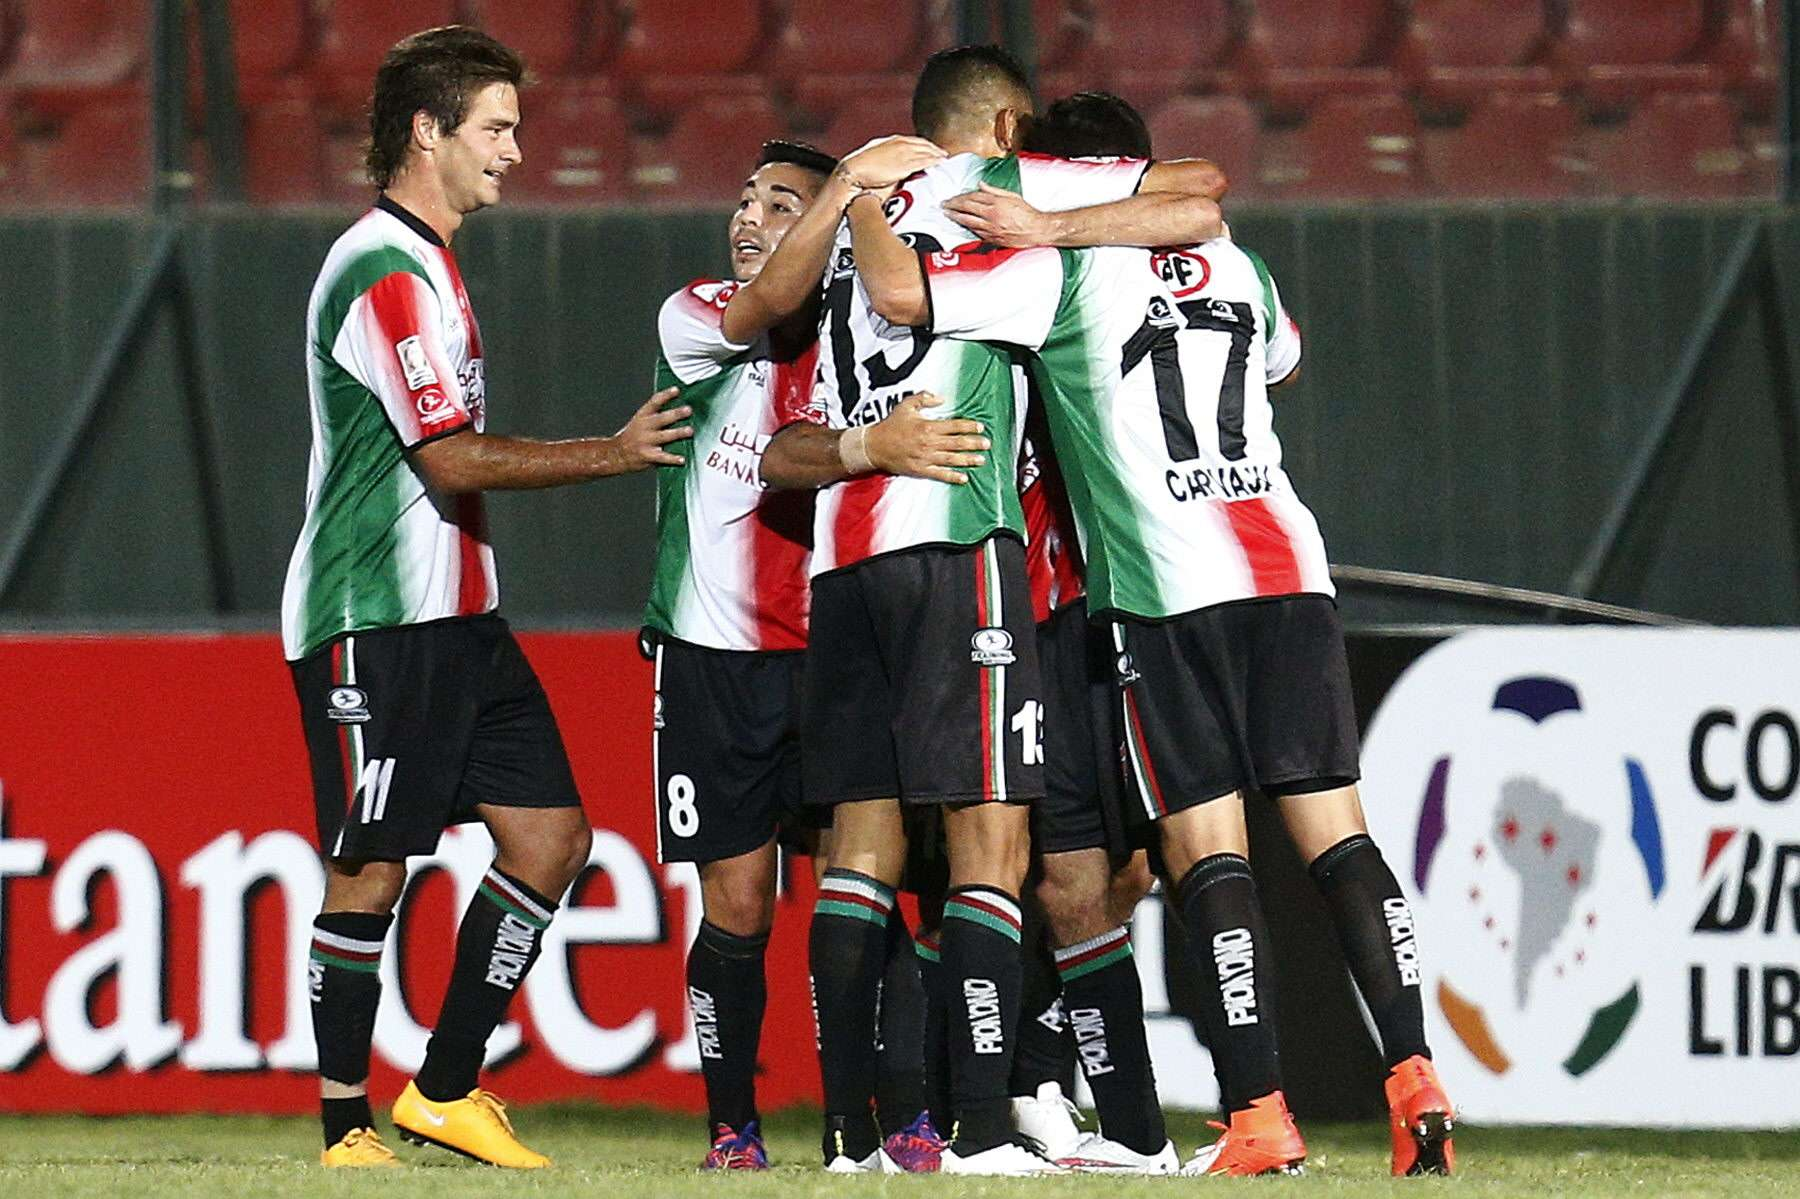 Palestino supera Nacional do Uruguai nesta quinta-feira Foto: Felipe Trueba/EFE